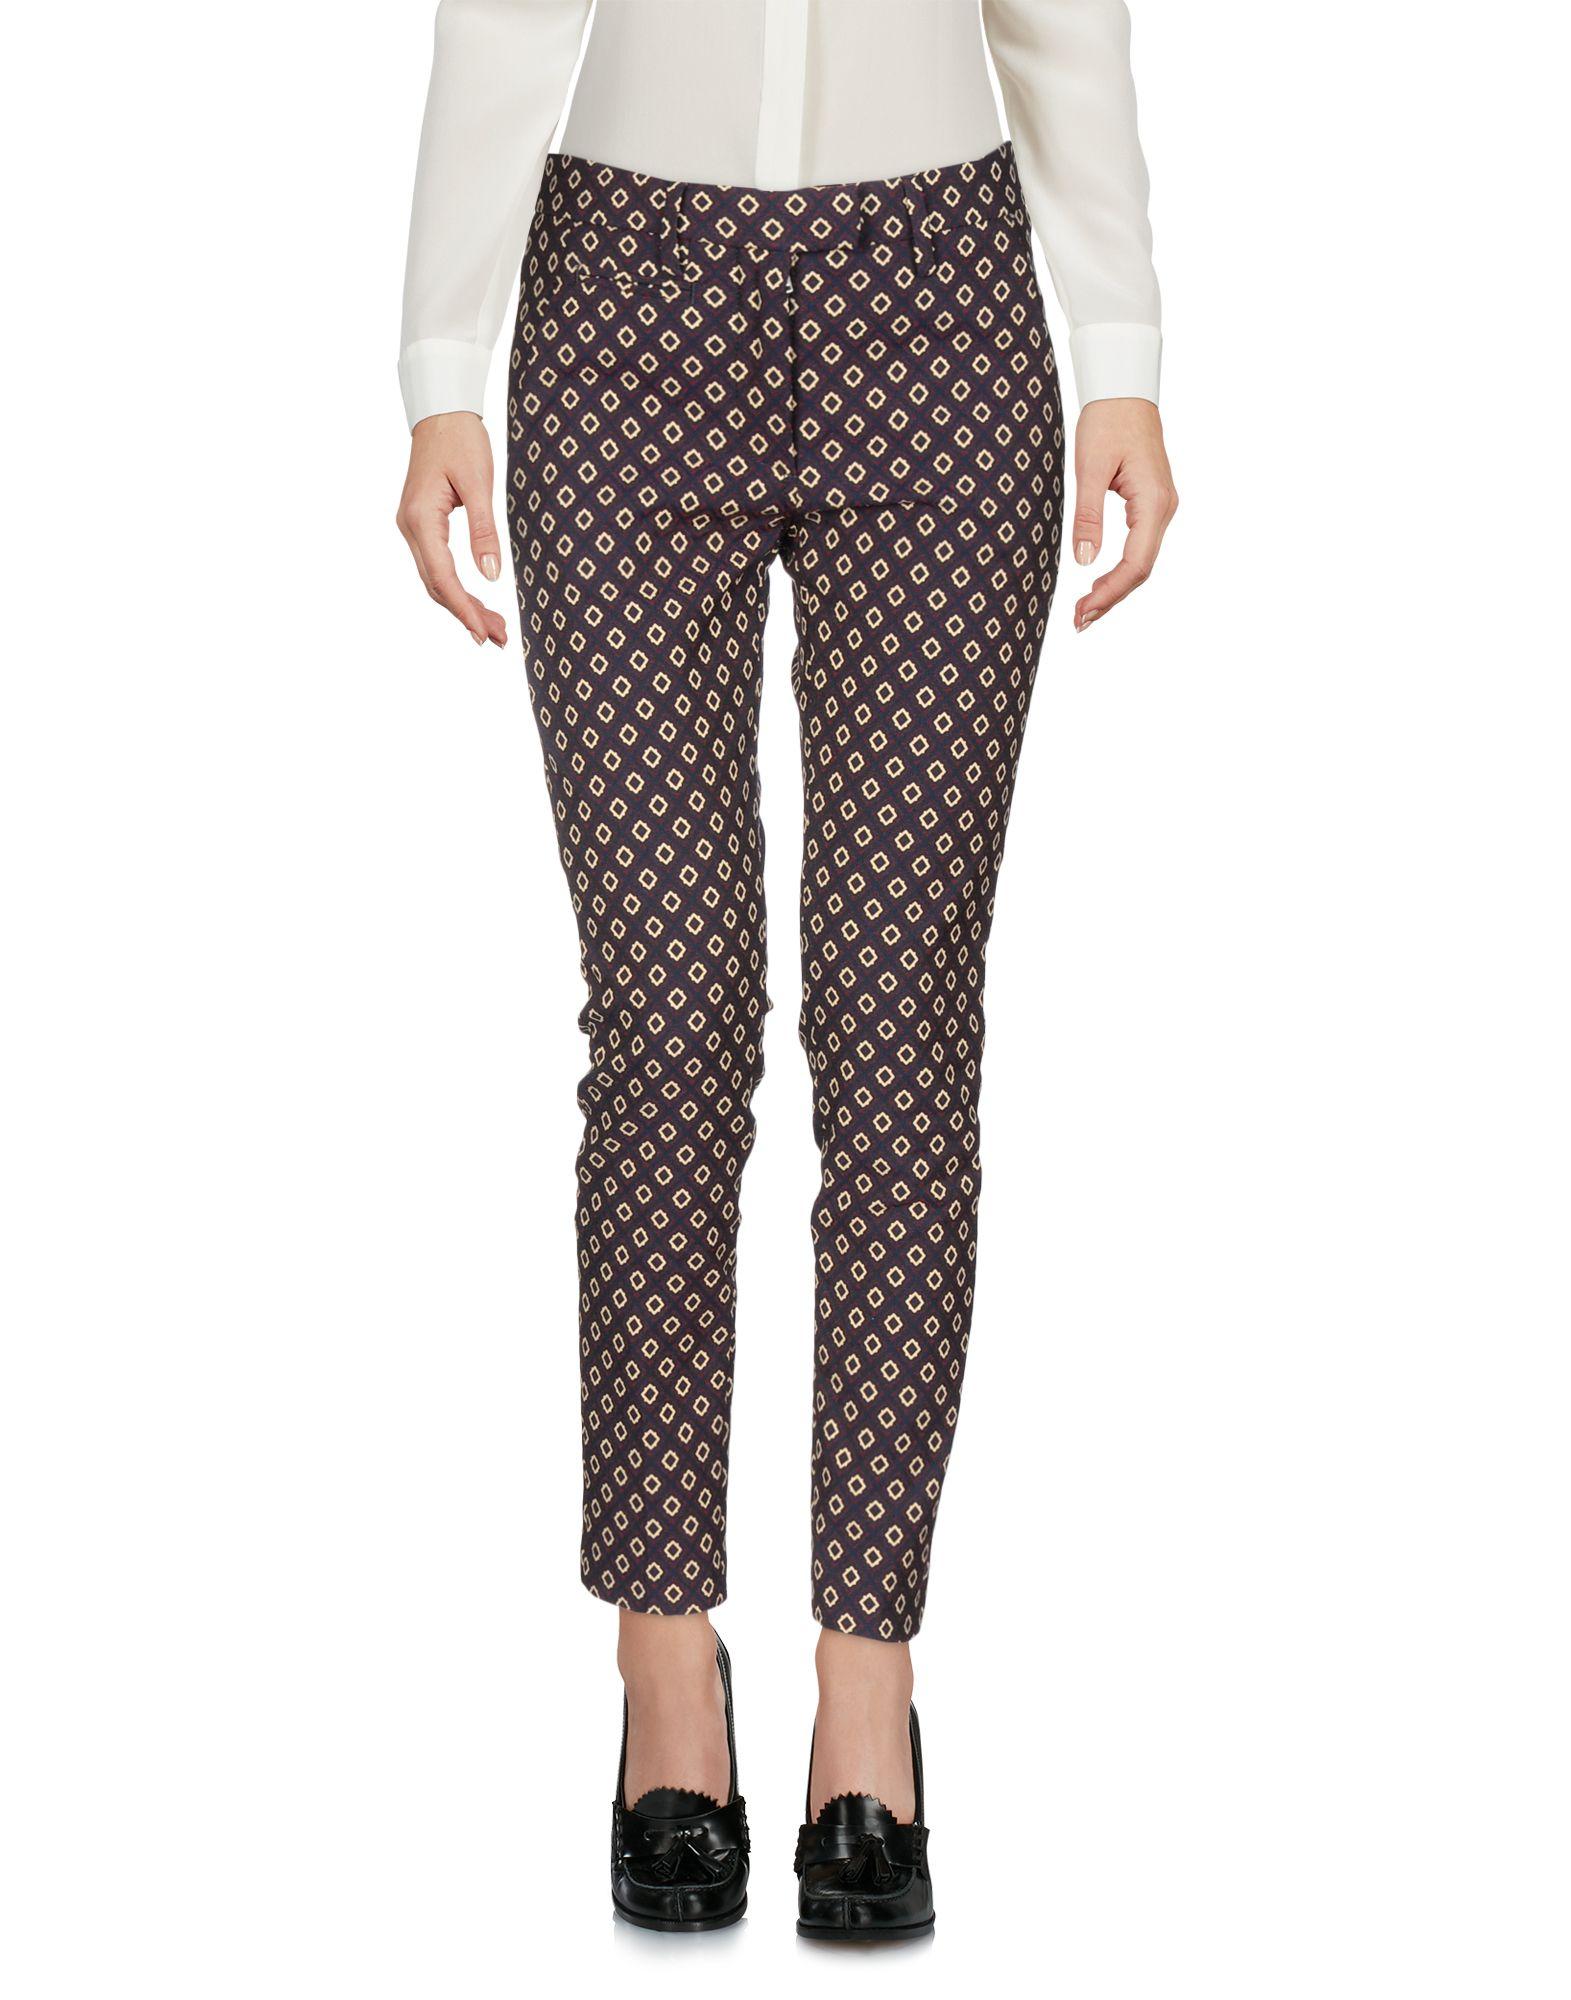 Pantalone Dondup Donna - Acquista online su X5kM1g